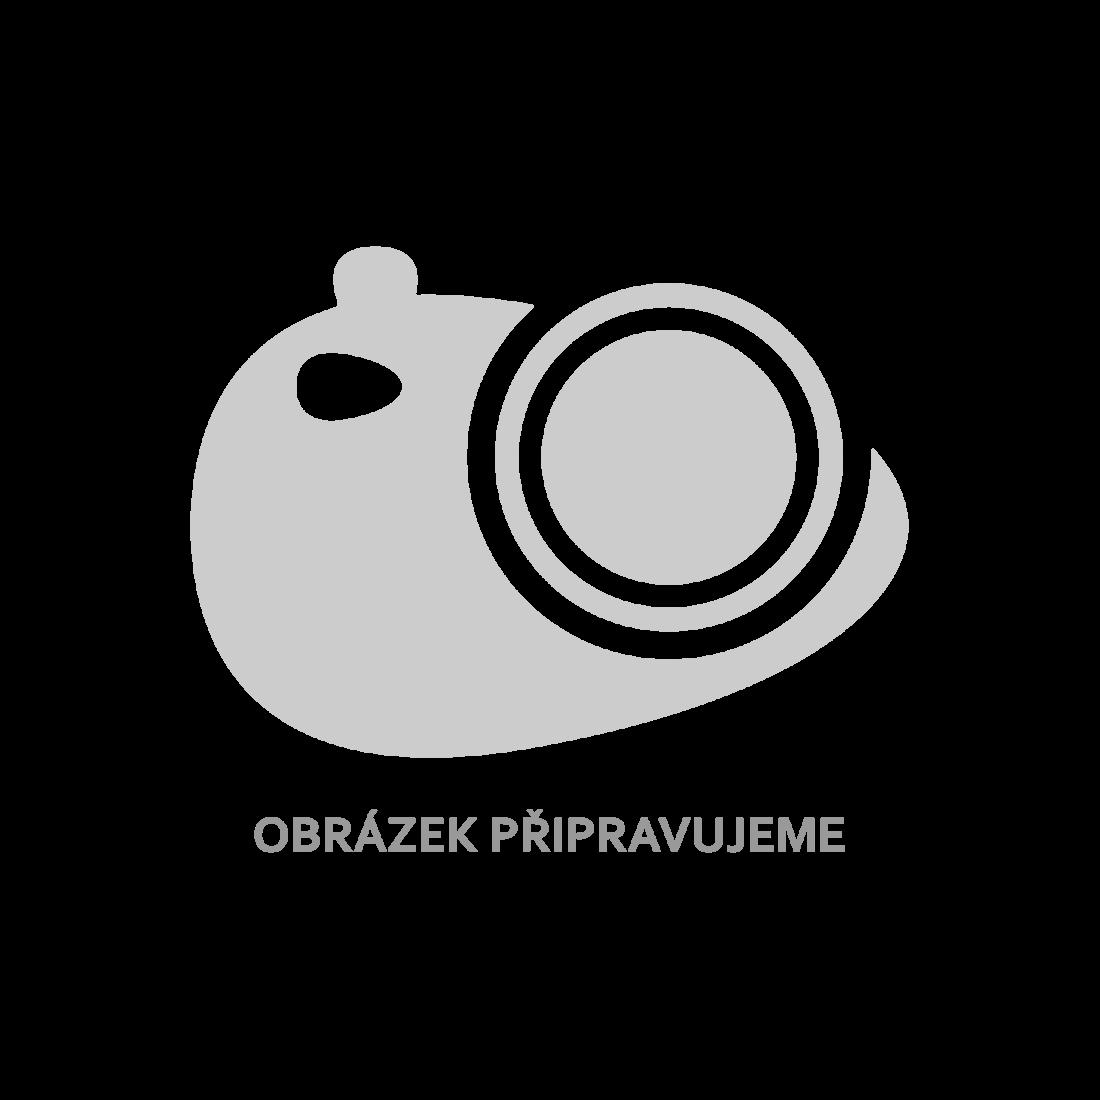 vidaXL Úložný box se sedákem 80 x 40 x 40 cm MDF [280033]